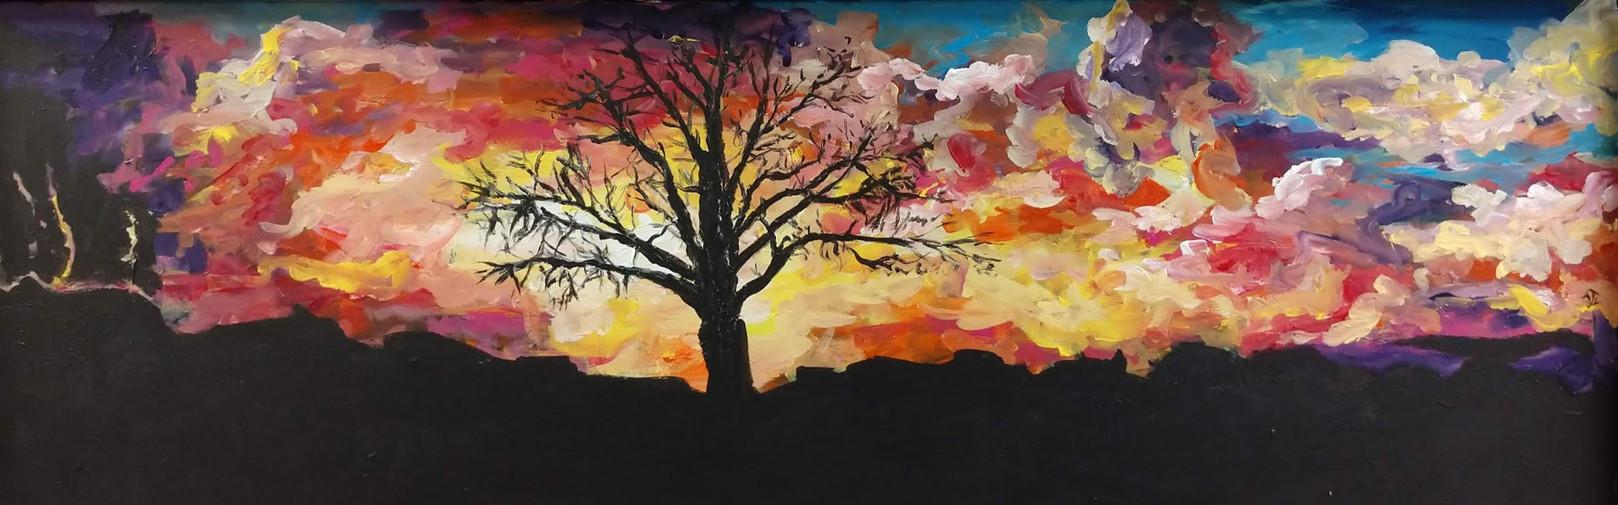 Tree and Sunset Landscape.jpg